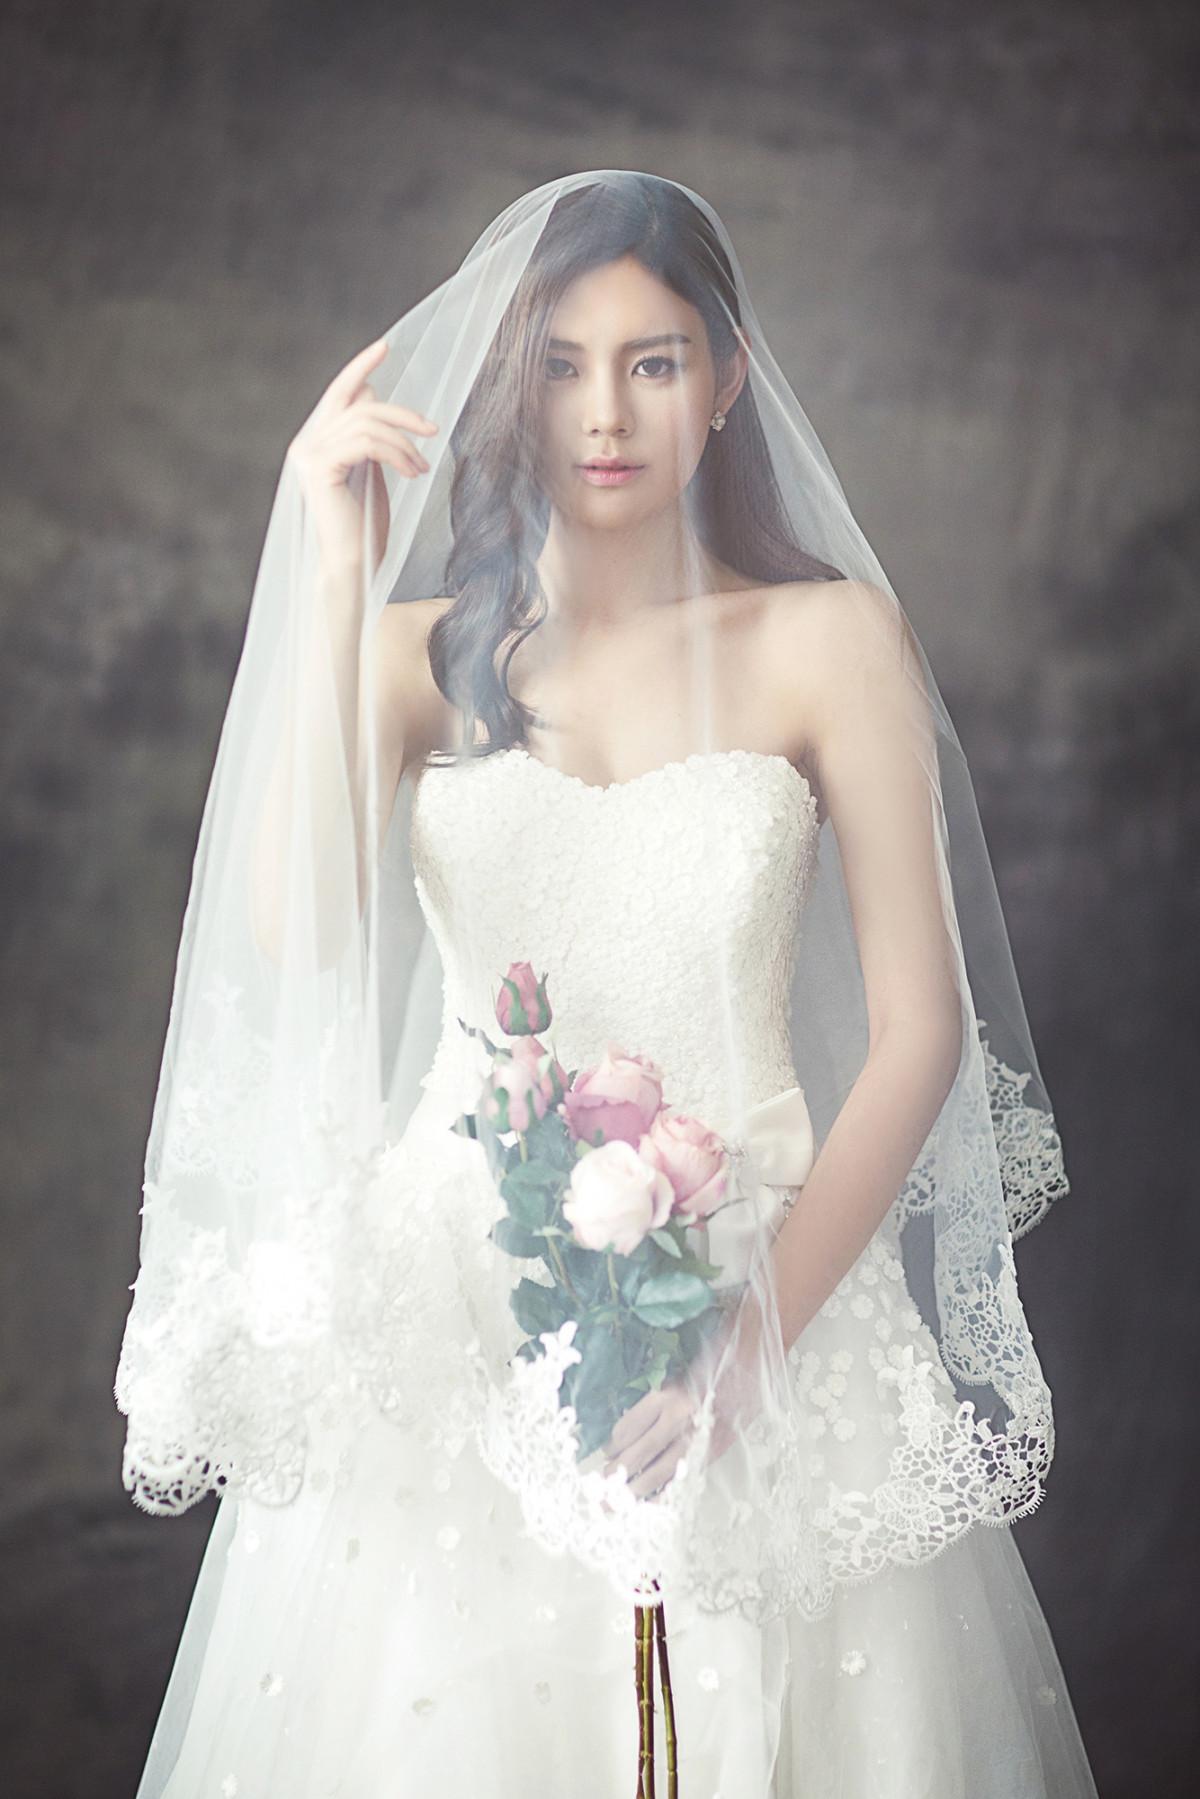 Free Images : flower, wedding dress, bride, white dress ...